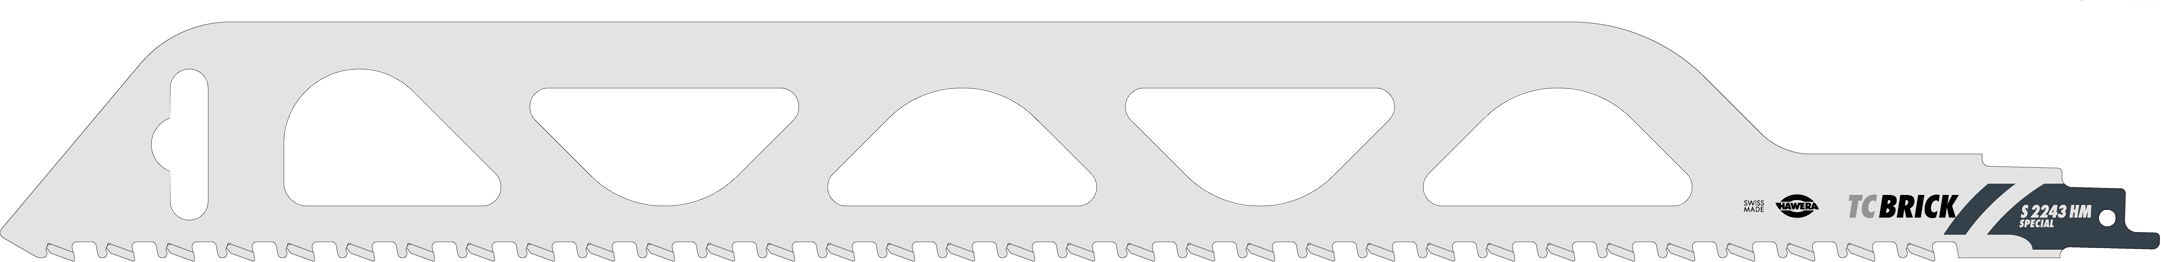 1x hawera s bels geblatt s2243hm tc brick f r mauerstein poroton gasbeton ebay. Black Bedroom Furniture Sets. Home Design Ideas